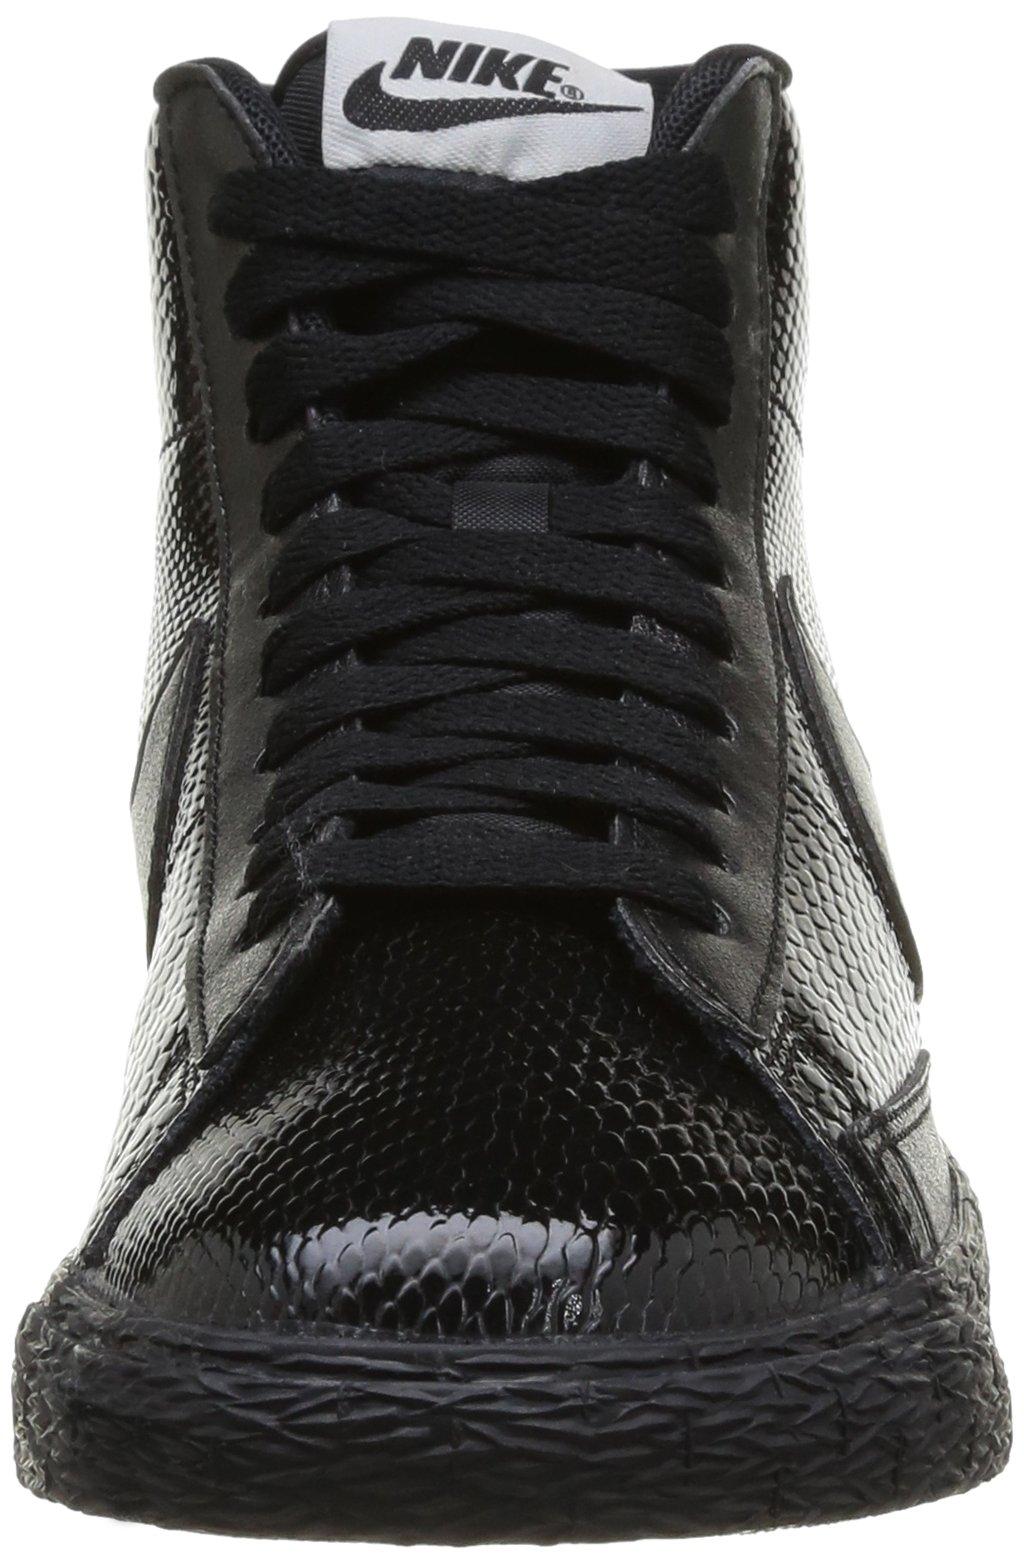 Nike Women's Blazer MID LTR PRM Black 685225-001 (SIZE: 8) by NIKE (Image #4)